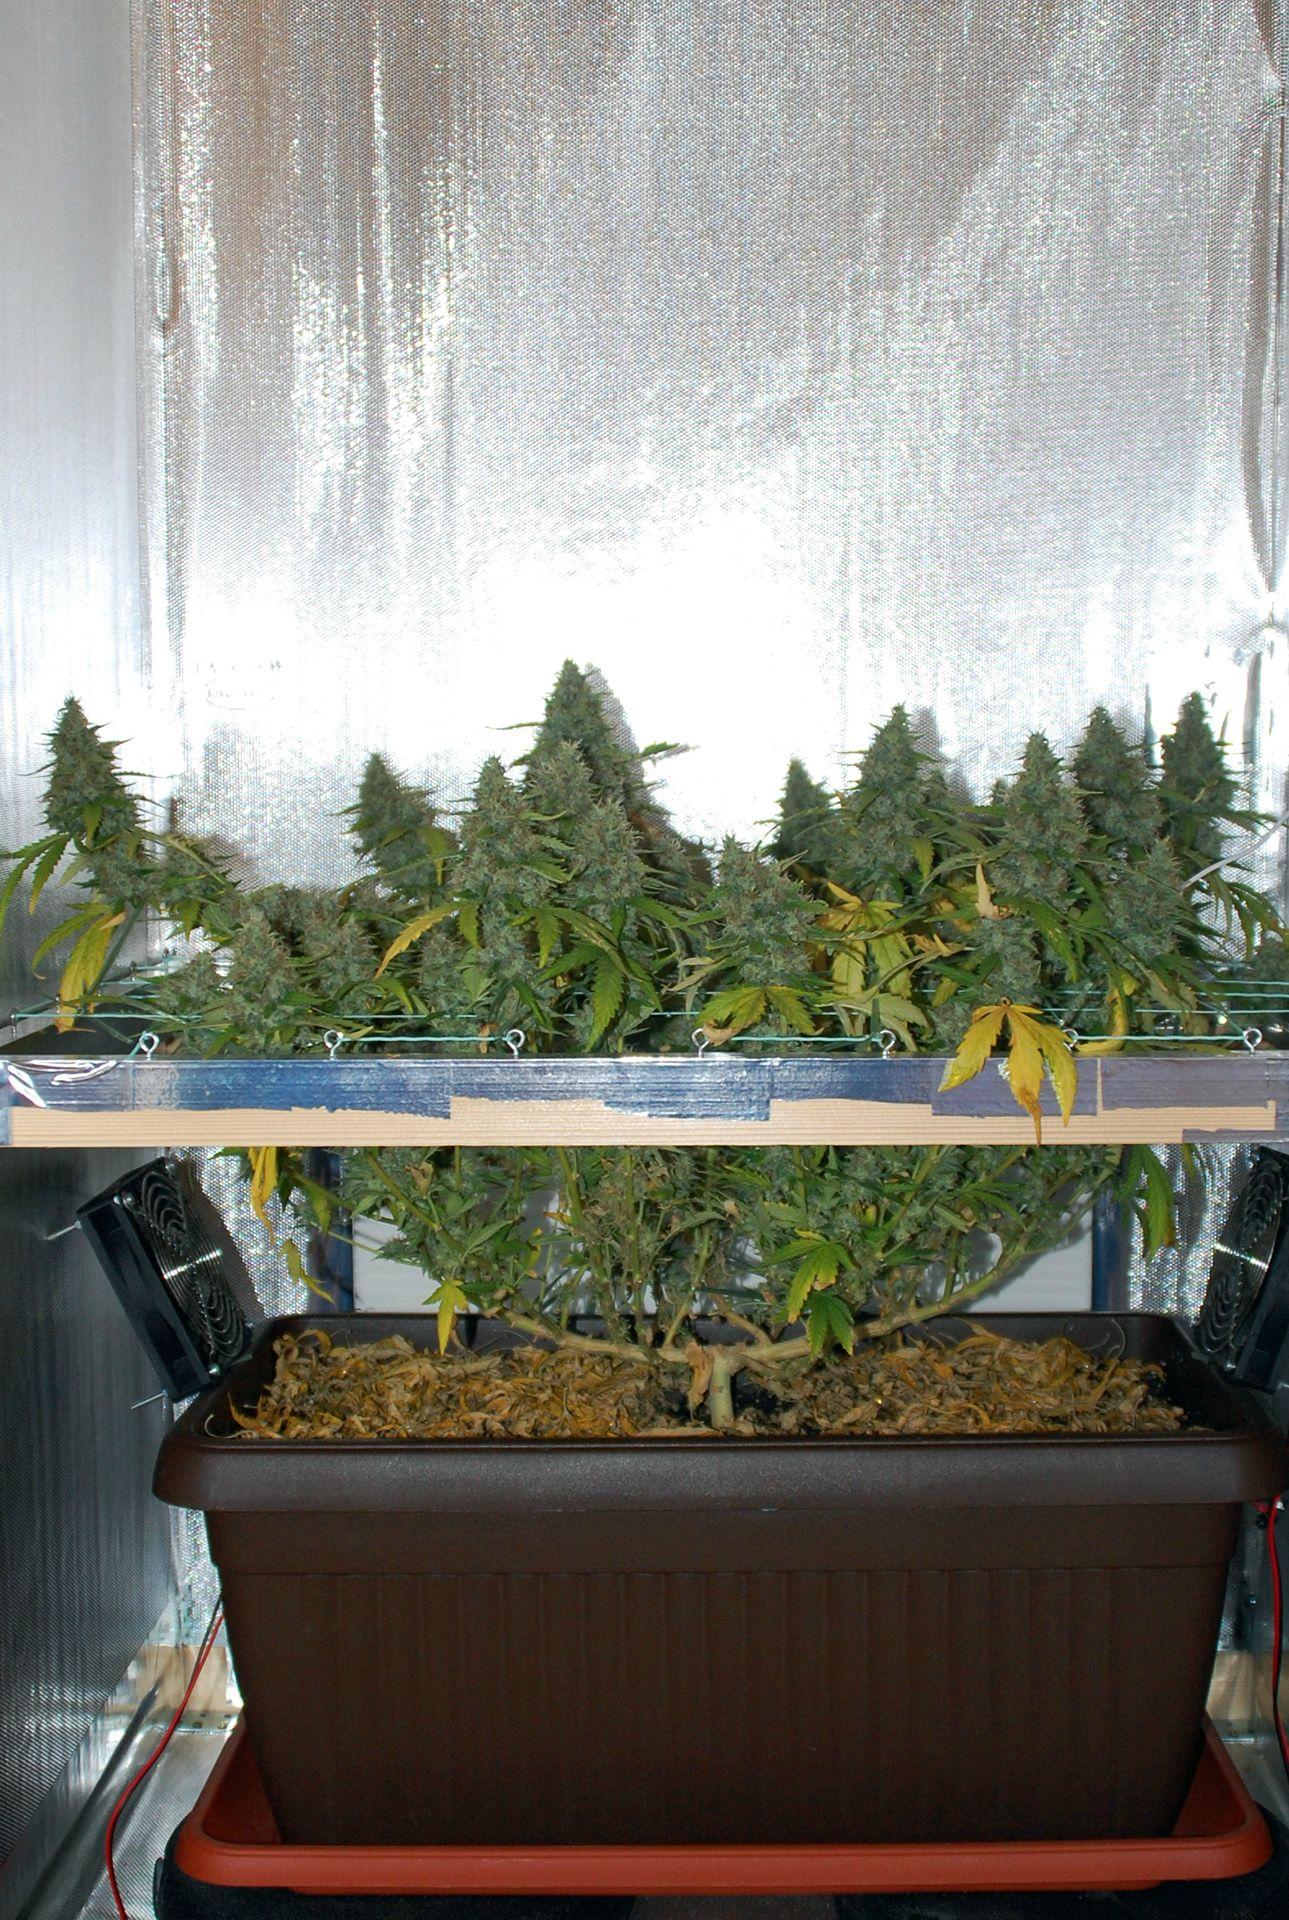 My secret garden @ 54 days (new DSLR camera)